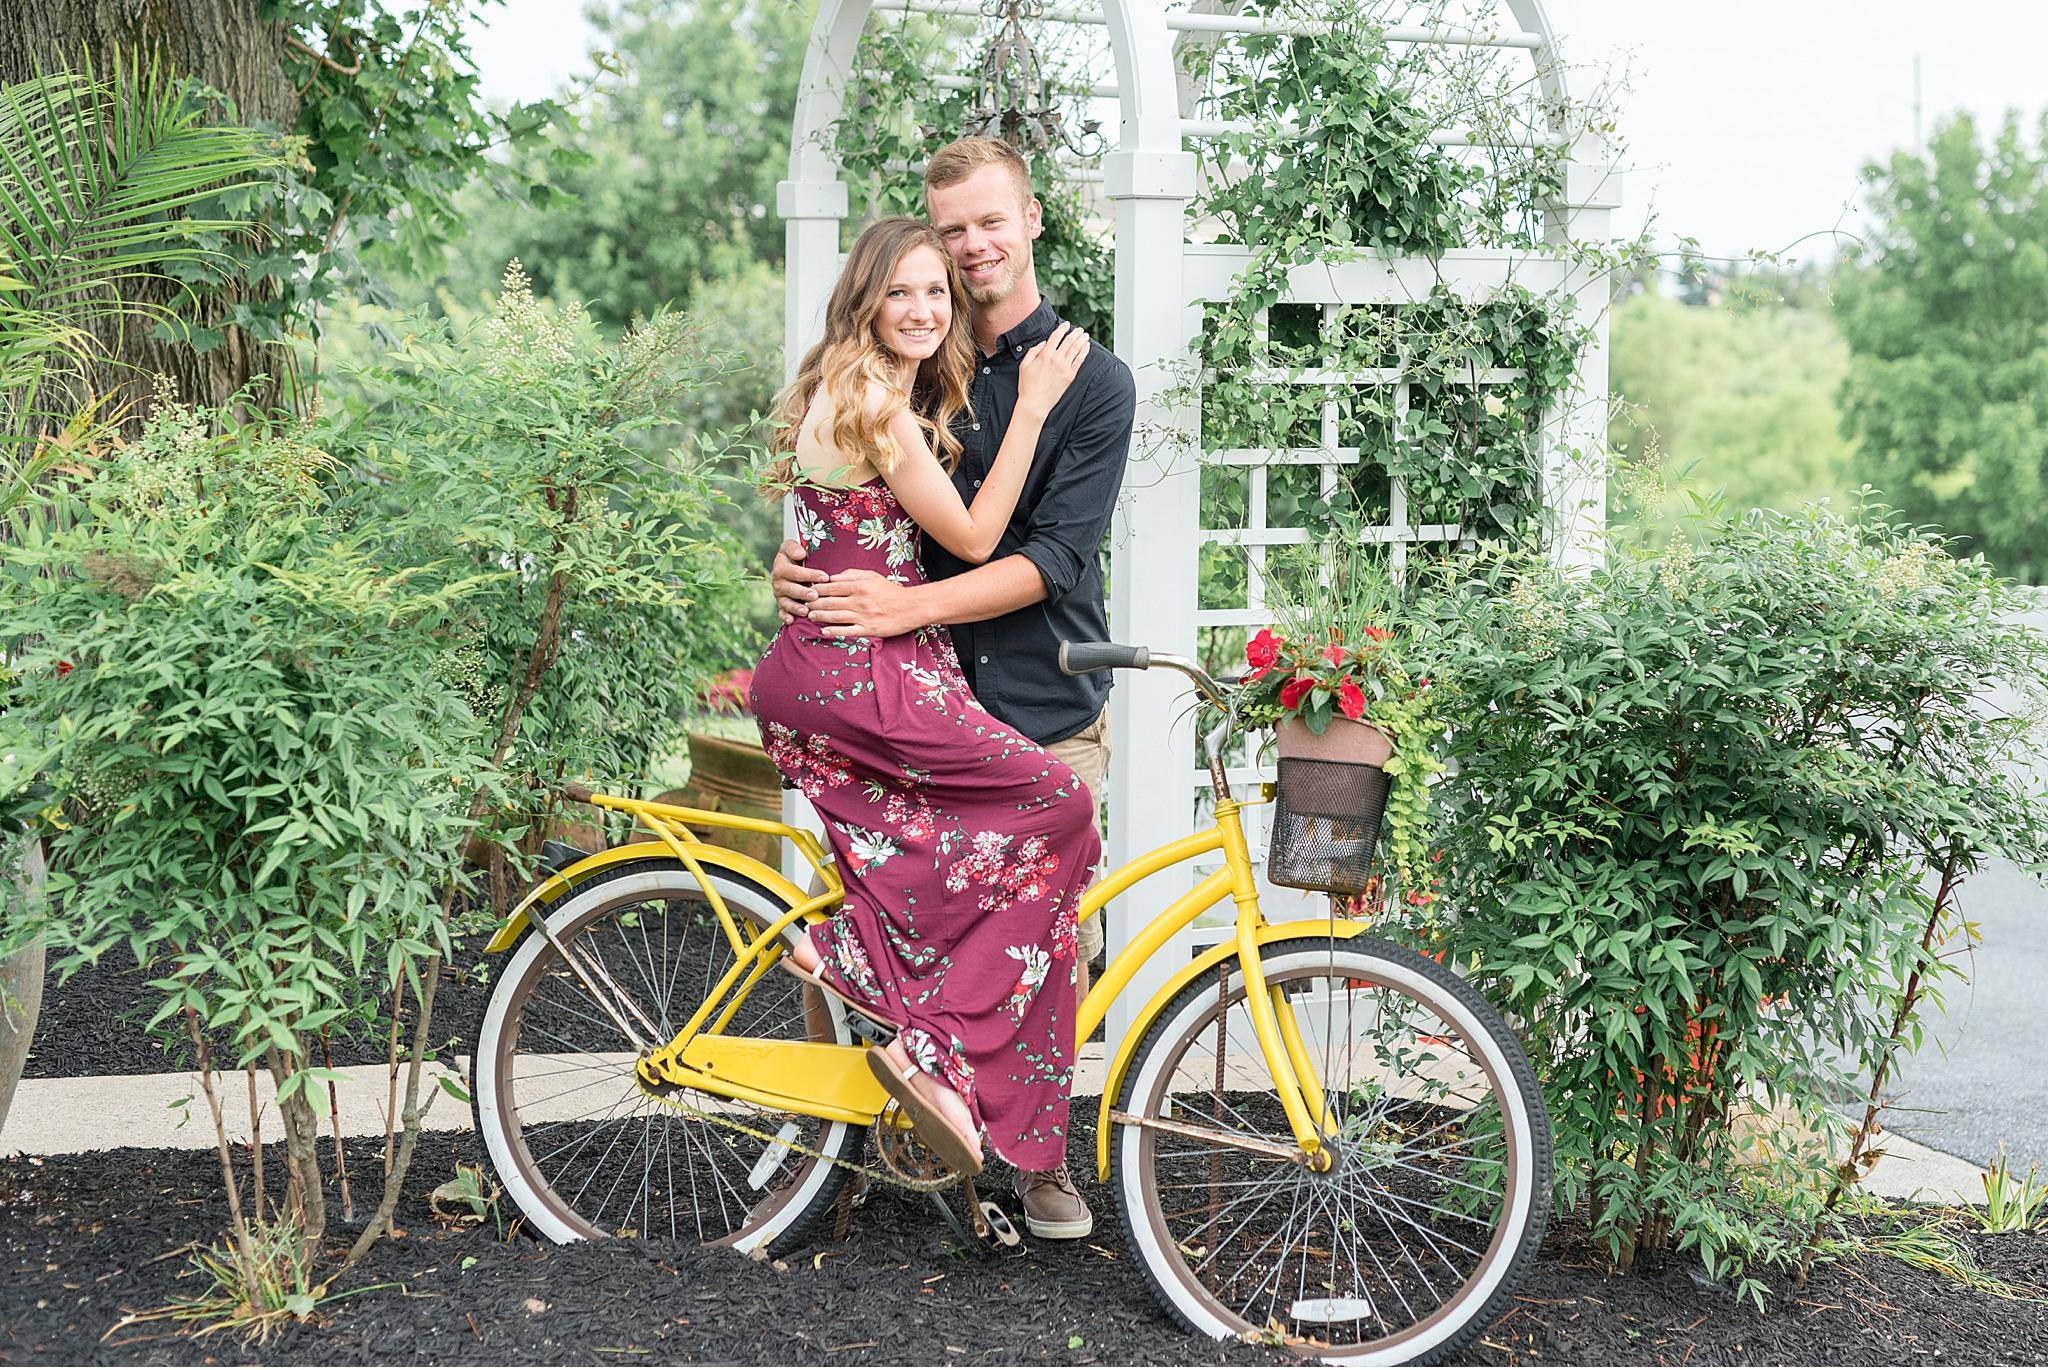 Cedar hollow farm engagement photography bride and groom on yellow bike